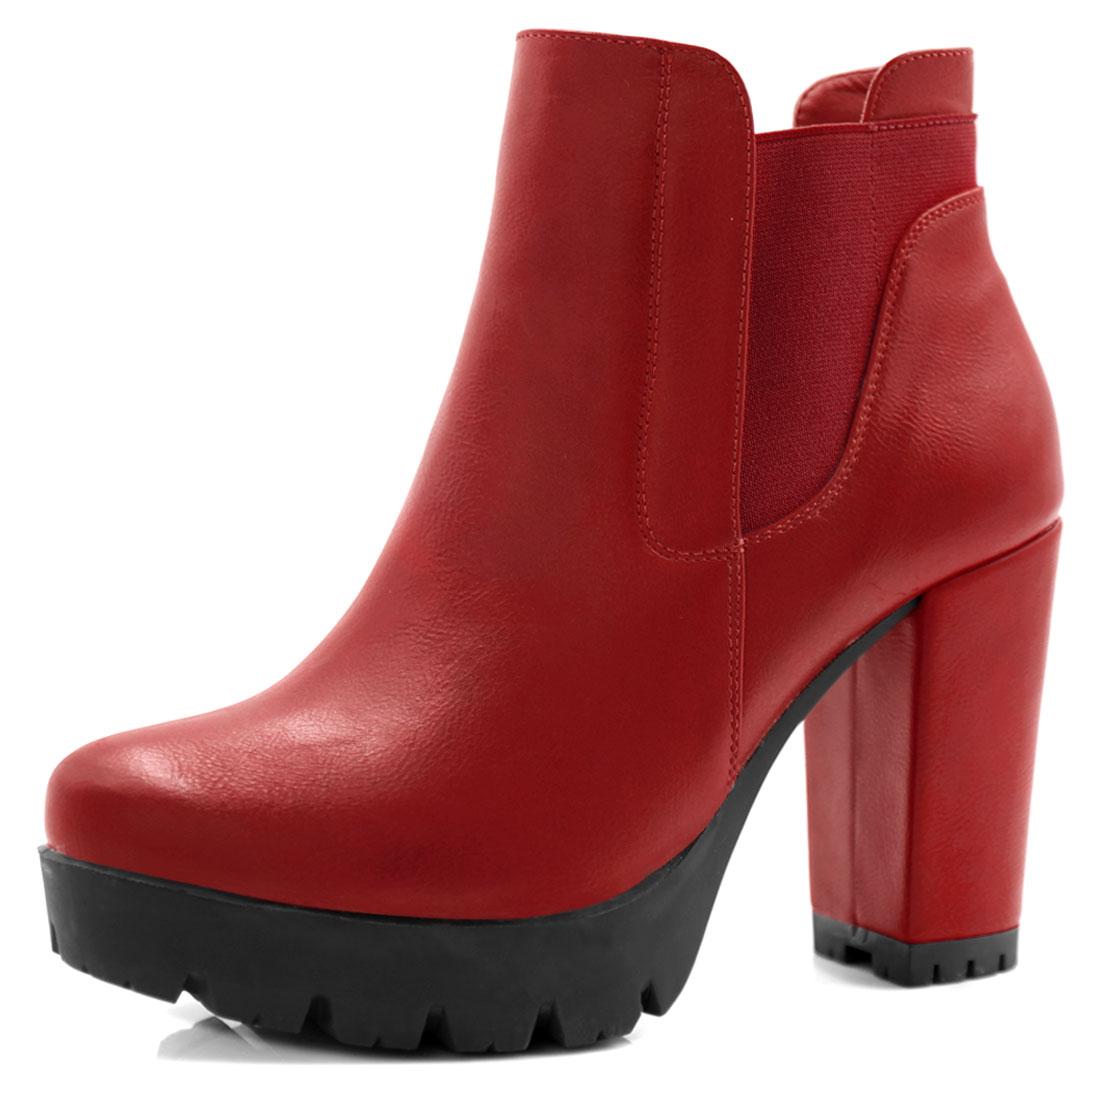 Allegra K Women Chunky High Heel Platform Zipper Chelsea Boots Red US 7.5